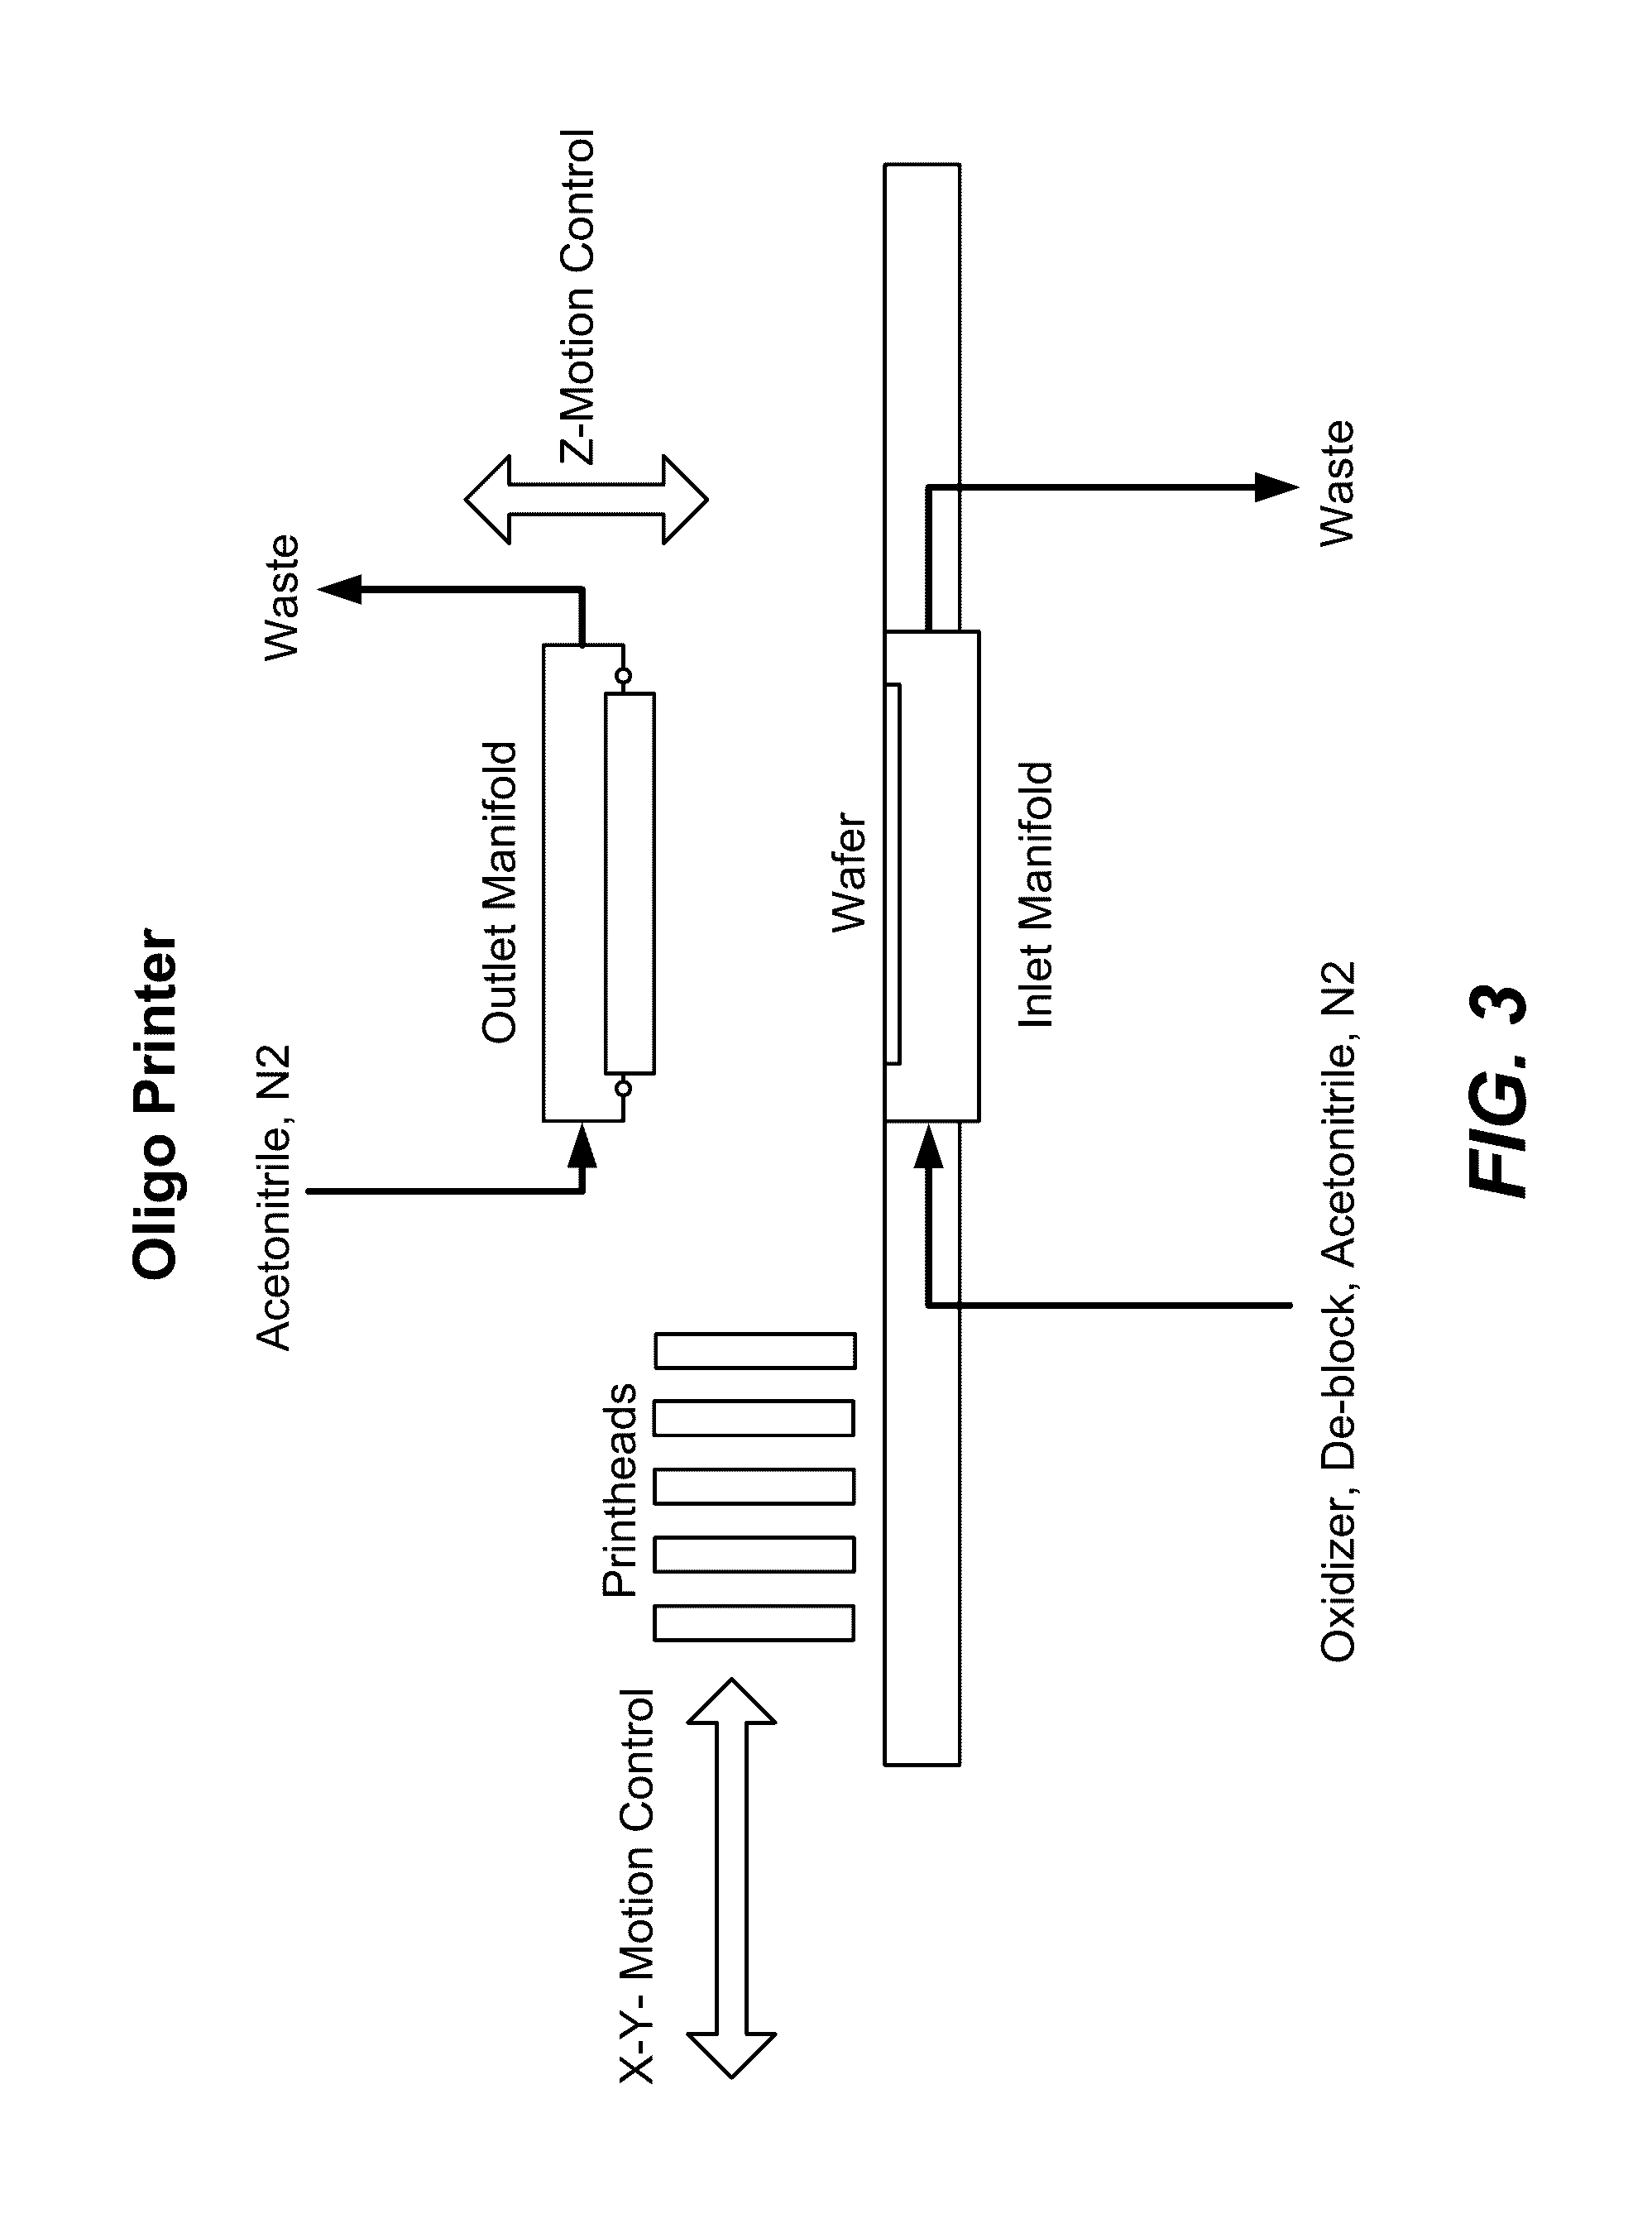 Patent US 9,555,388 B2